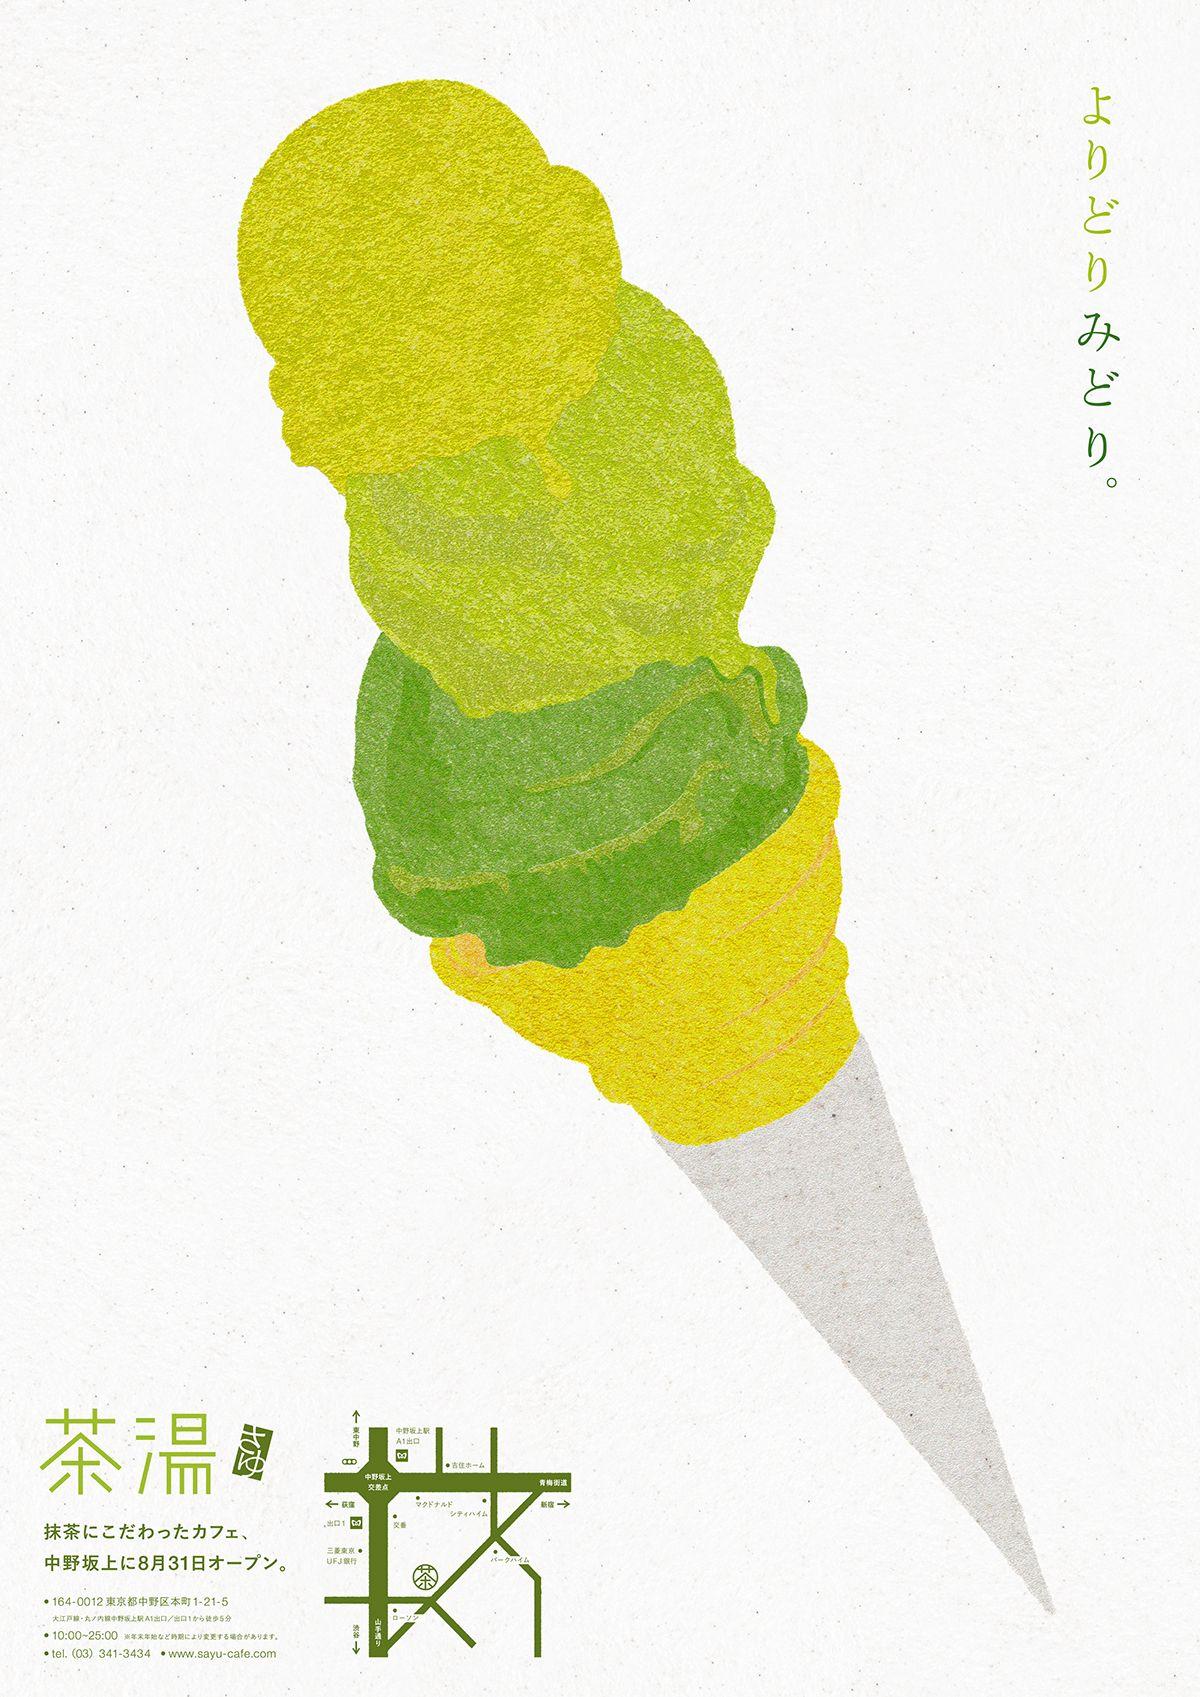 110828_sayu_a4-ice_ol